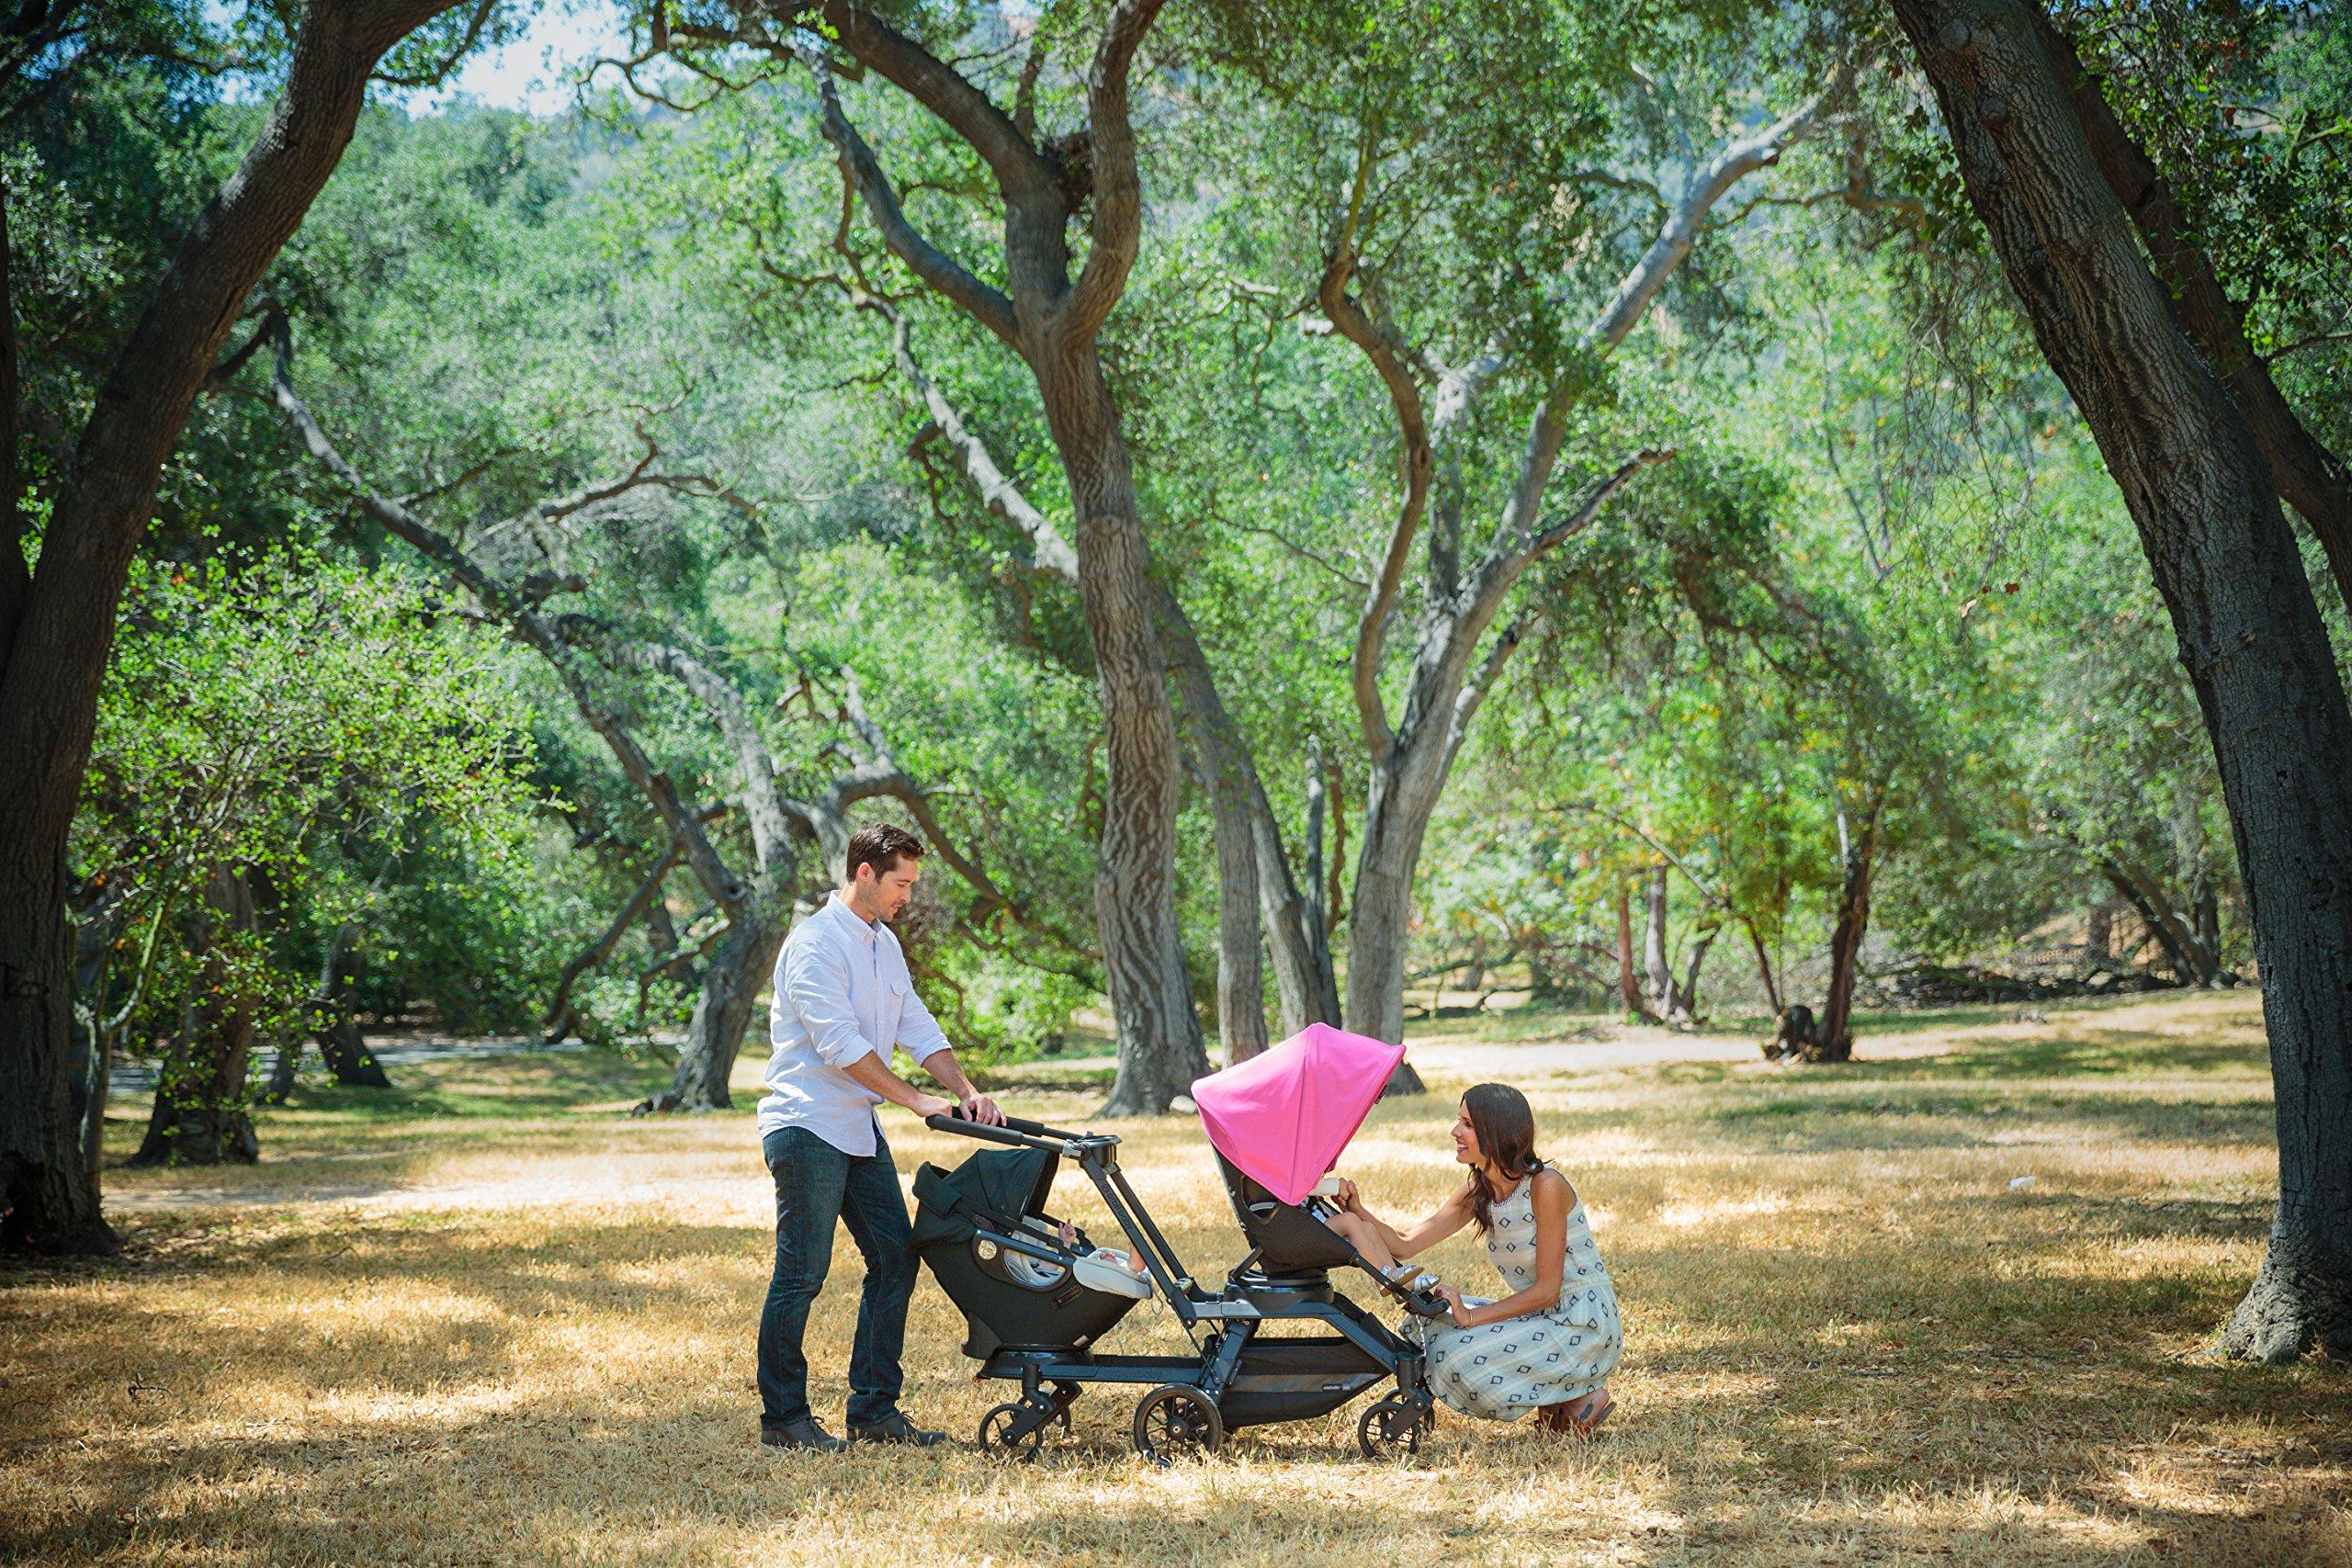 Orbit Baby Double Stroller Kit, Black by Orbit Baby (Image #2)